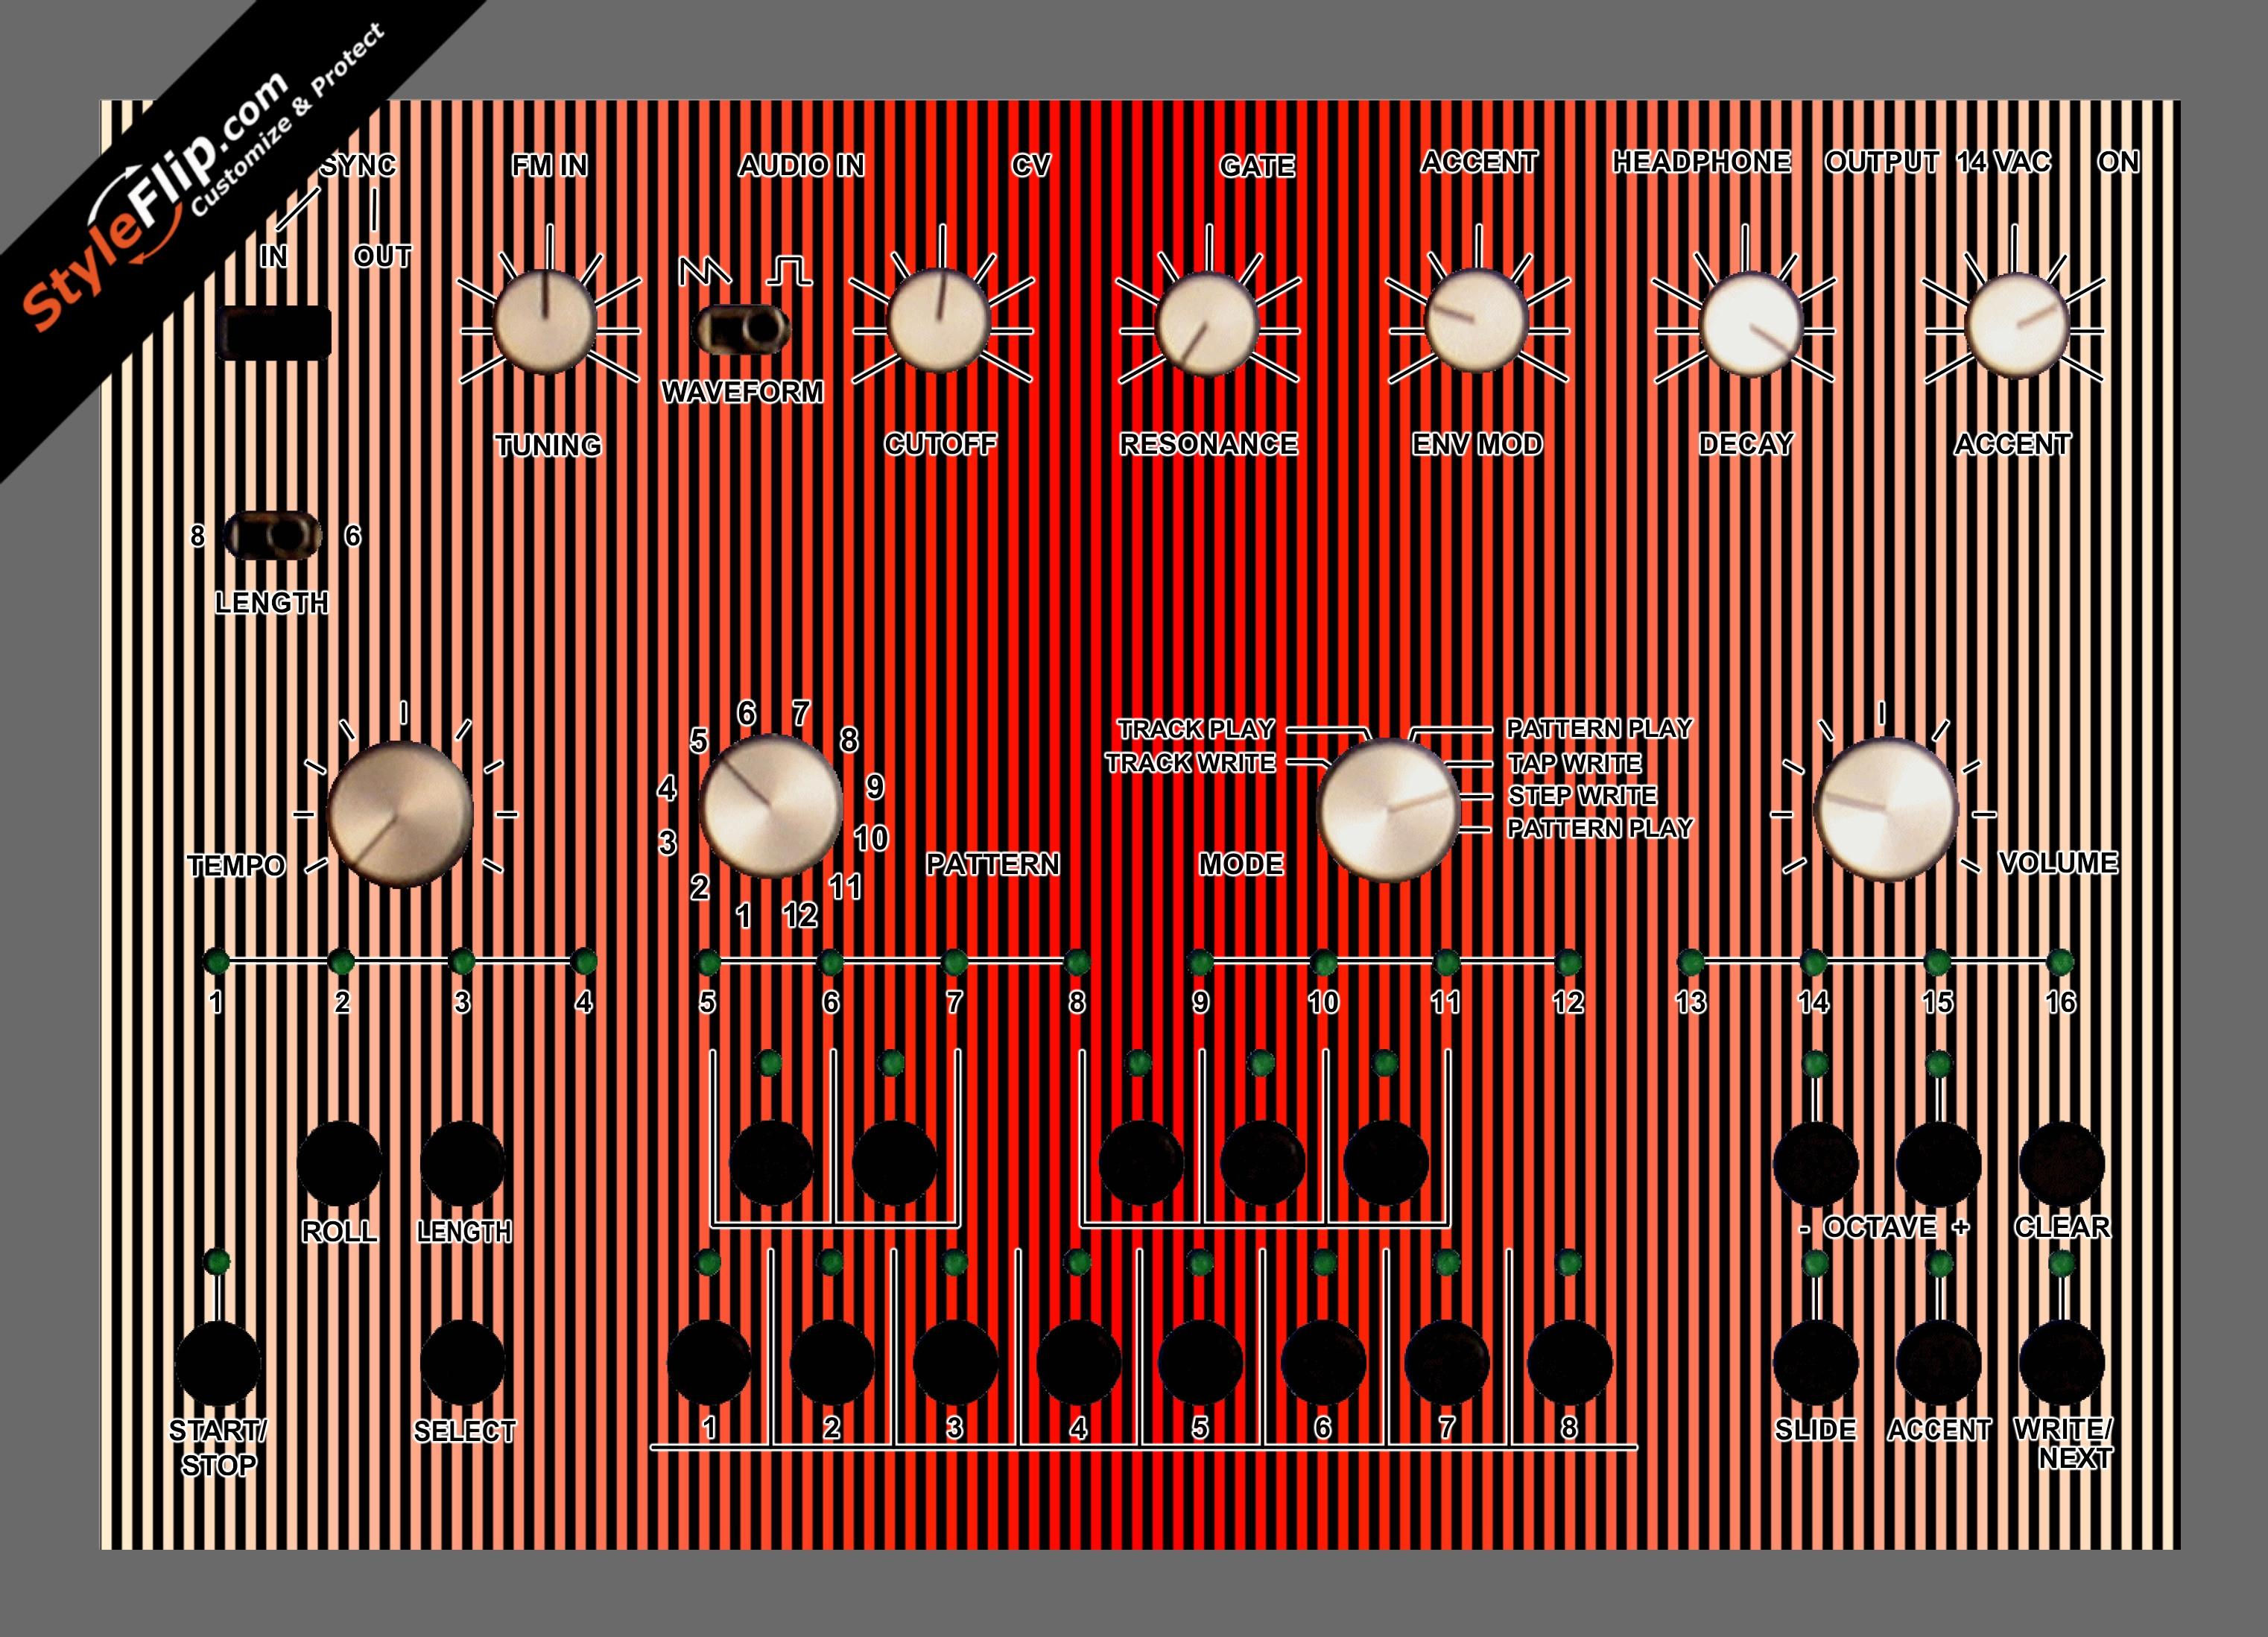 Red Stripes Acidlab Bassline 2